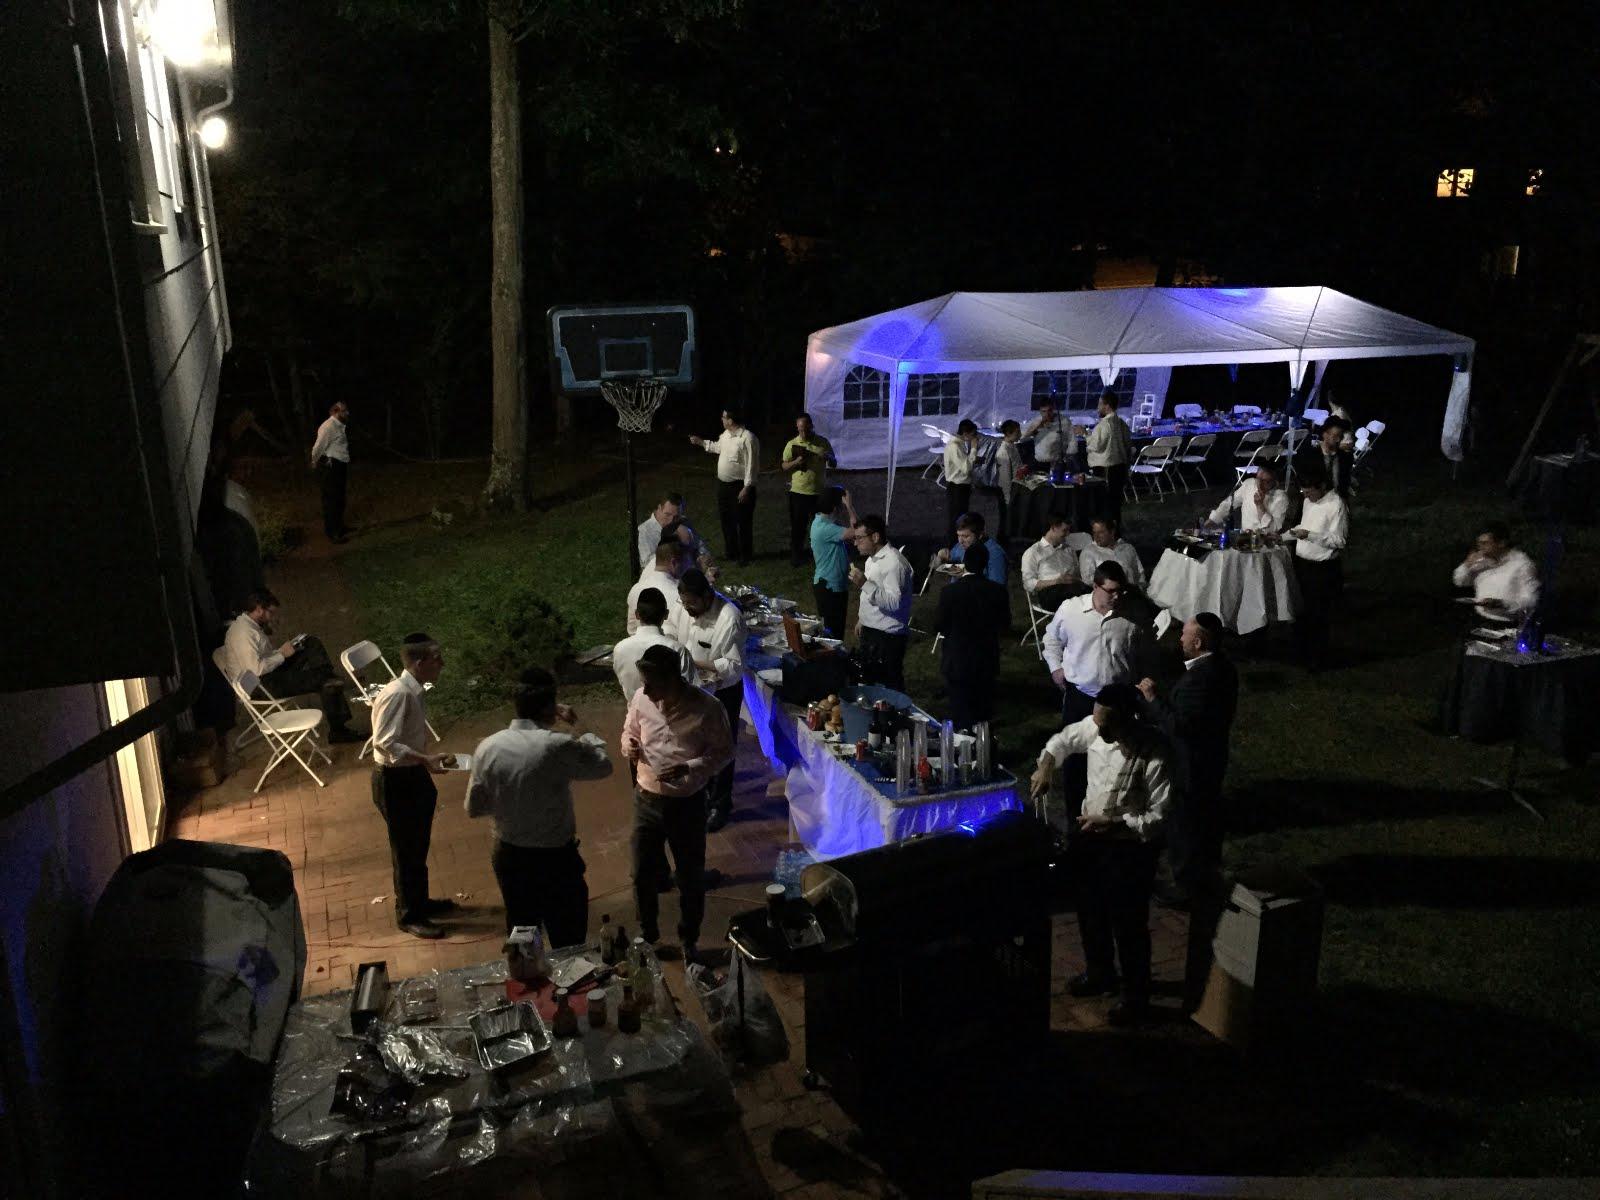 Siyum - BackYard Event